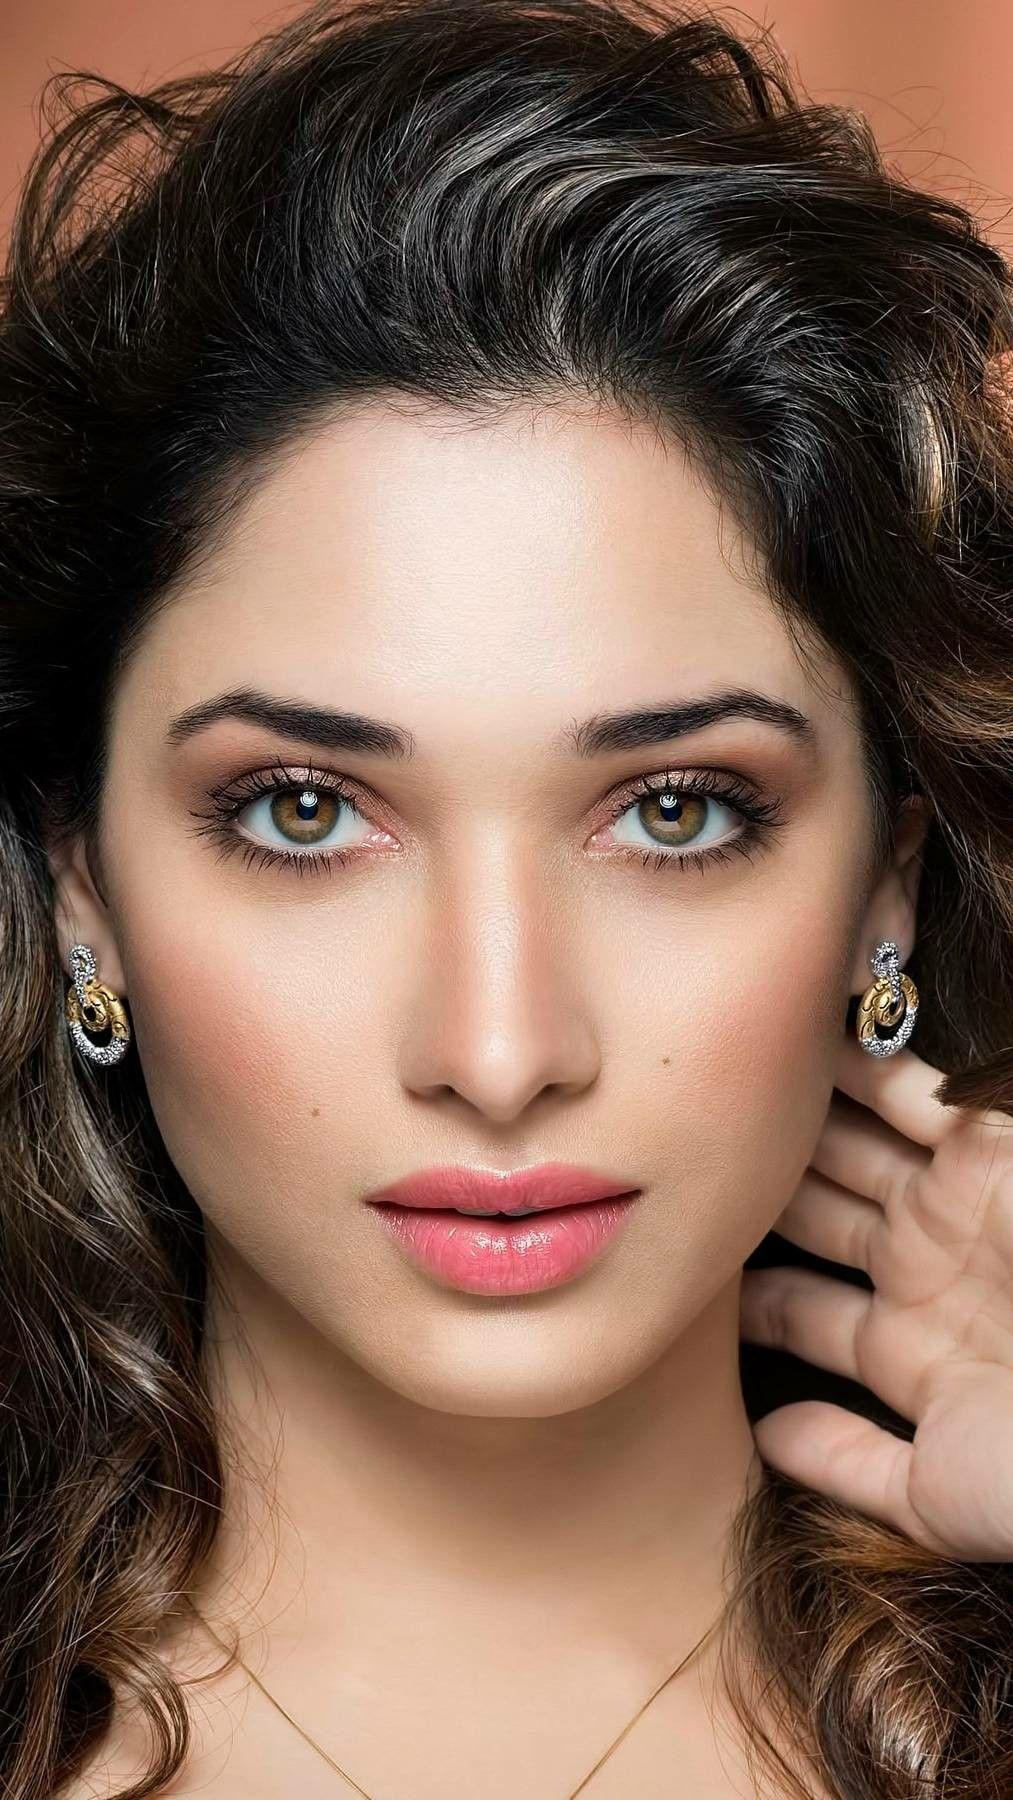 Tamanna Face Wallpaper  Bollywood Actresses  Pinterest-8808